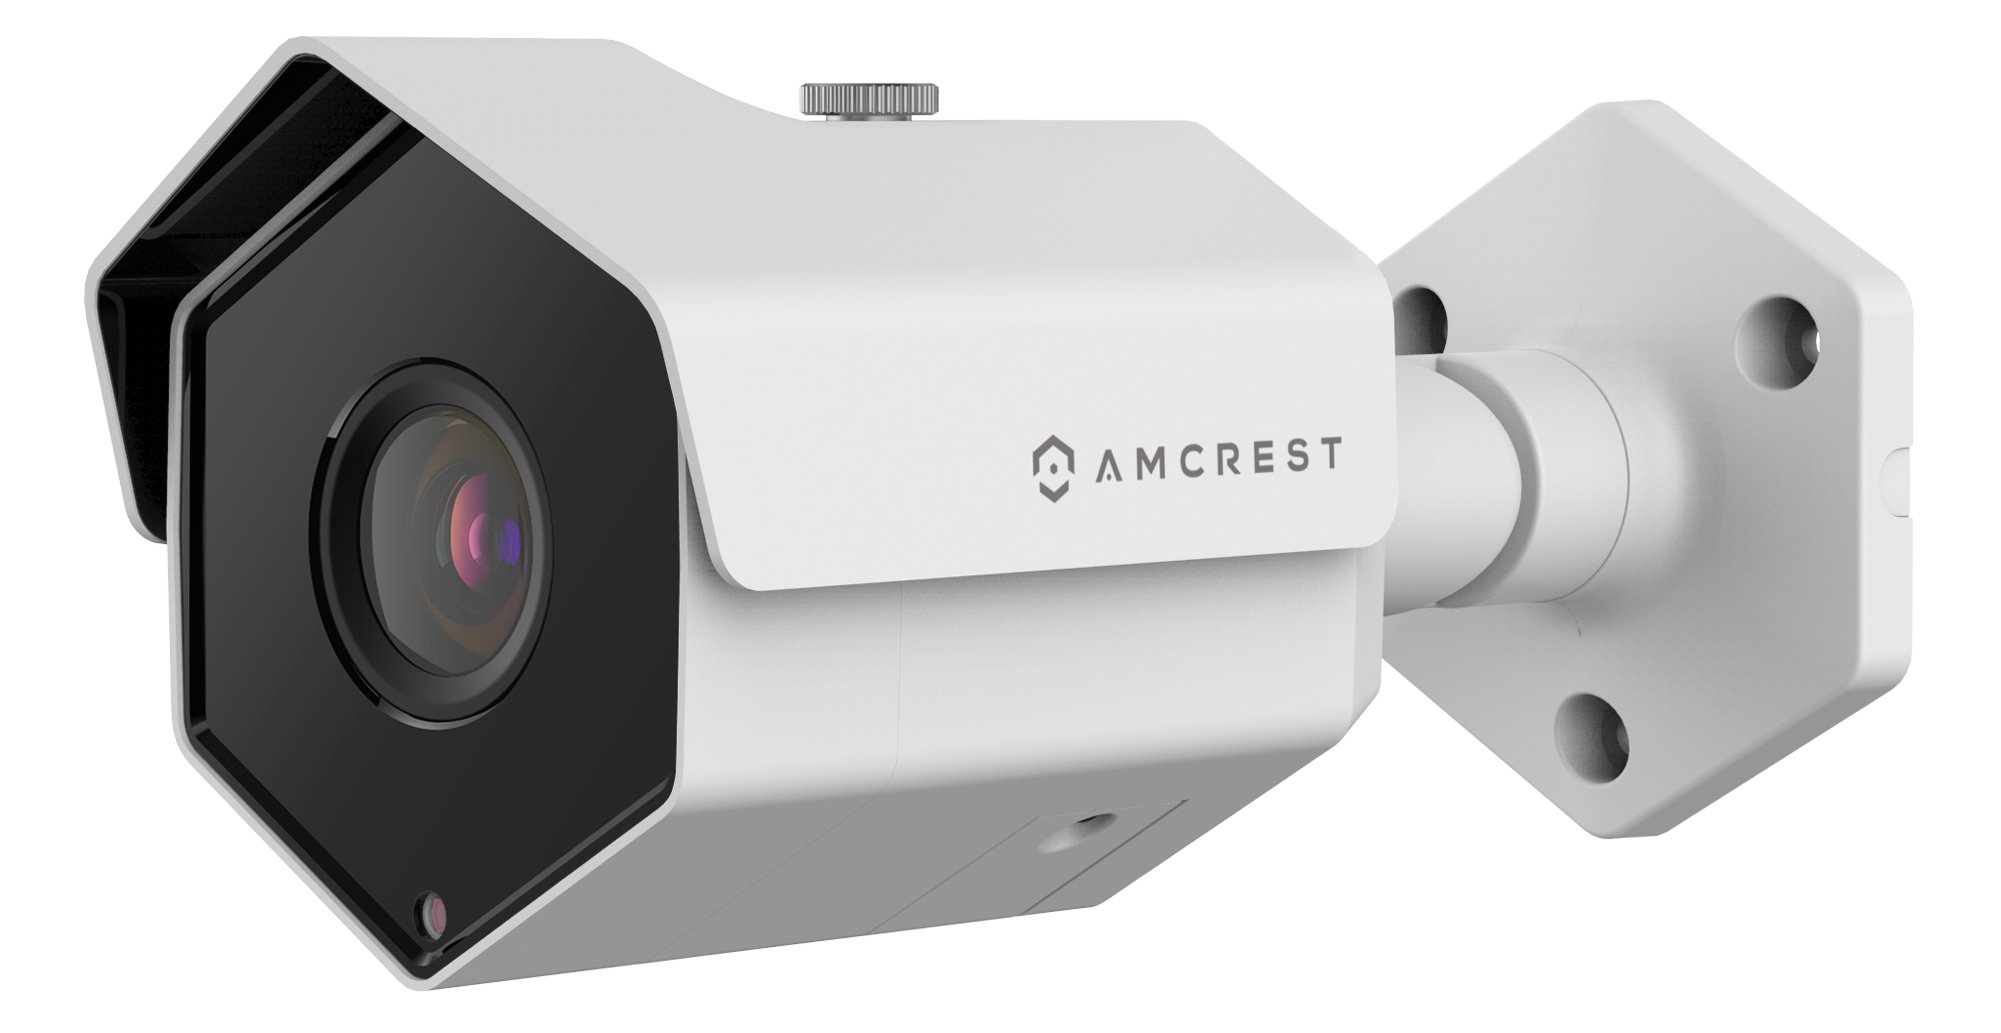 Amcrest ProHD Outdoor 1080P PoE IP Security Bullet Camera - IP67 Weatherproof, 1080P (1920TVL), IP2M-852EW (White)